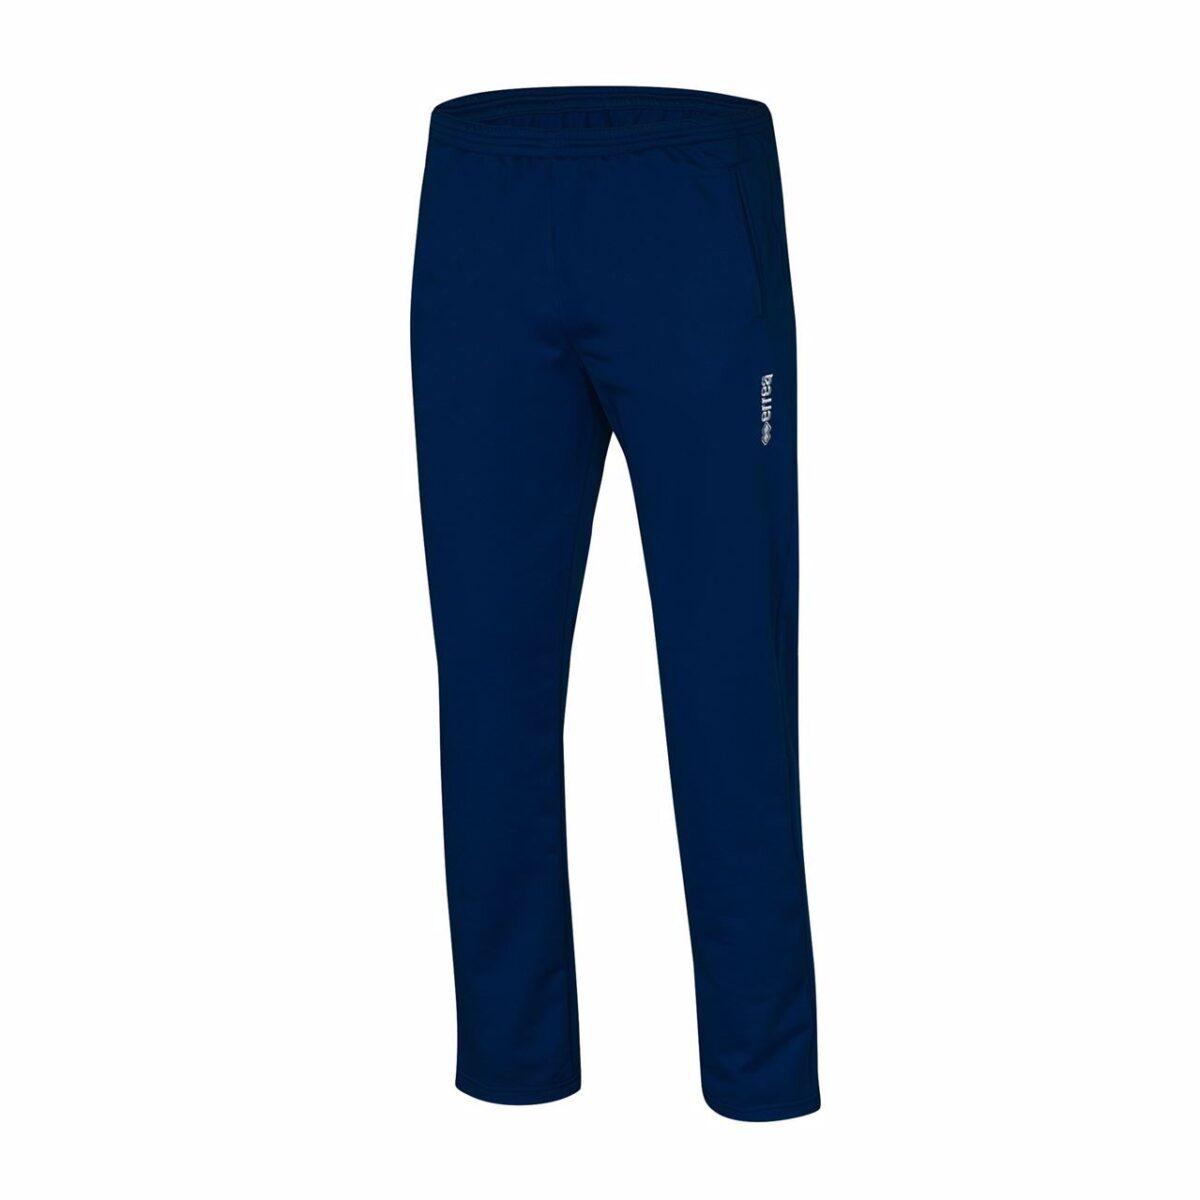 Errea CLAYTON Junior Trackpant Trousers FP821Z